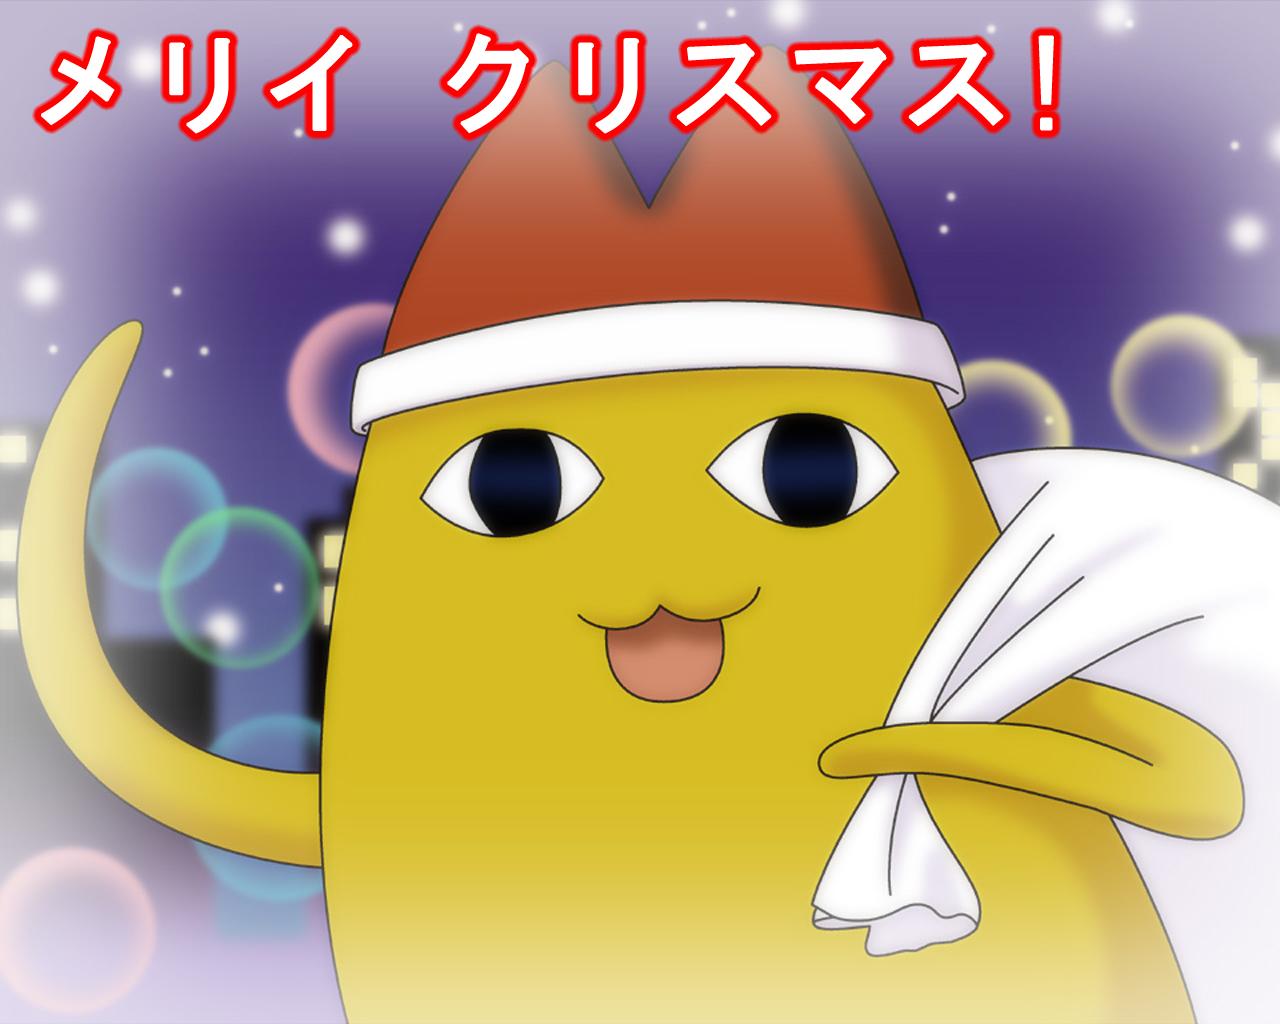 azumanga_daioh chiyo_father christmas hat santa_hat